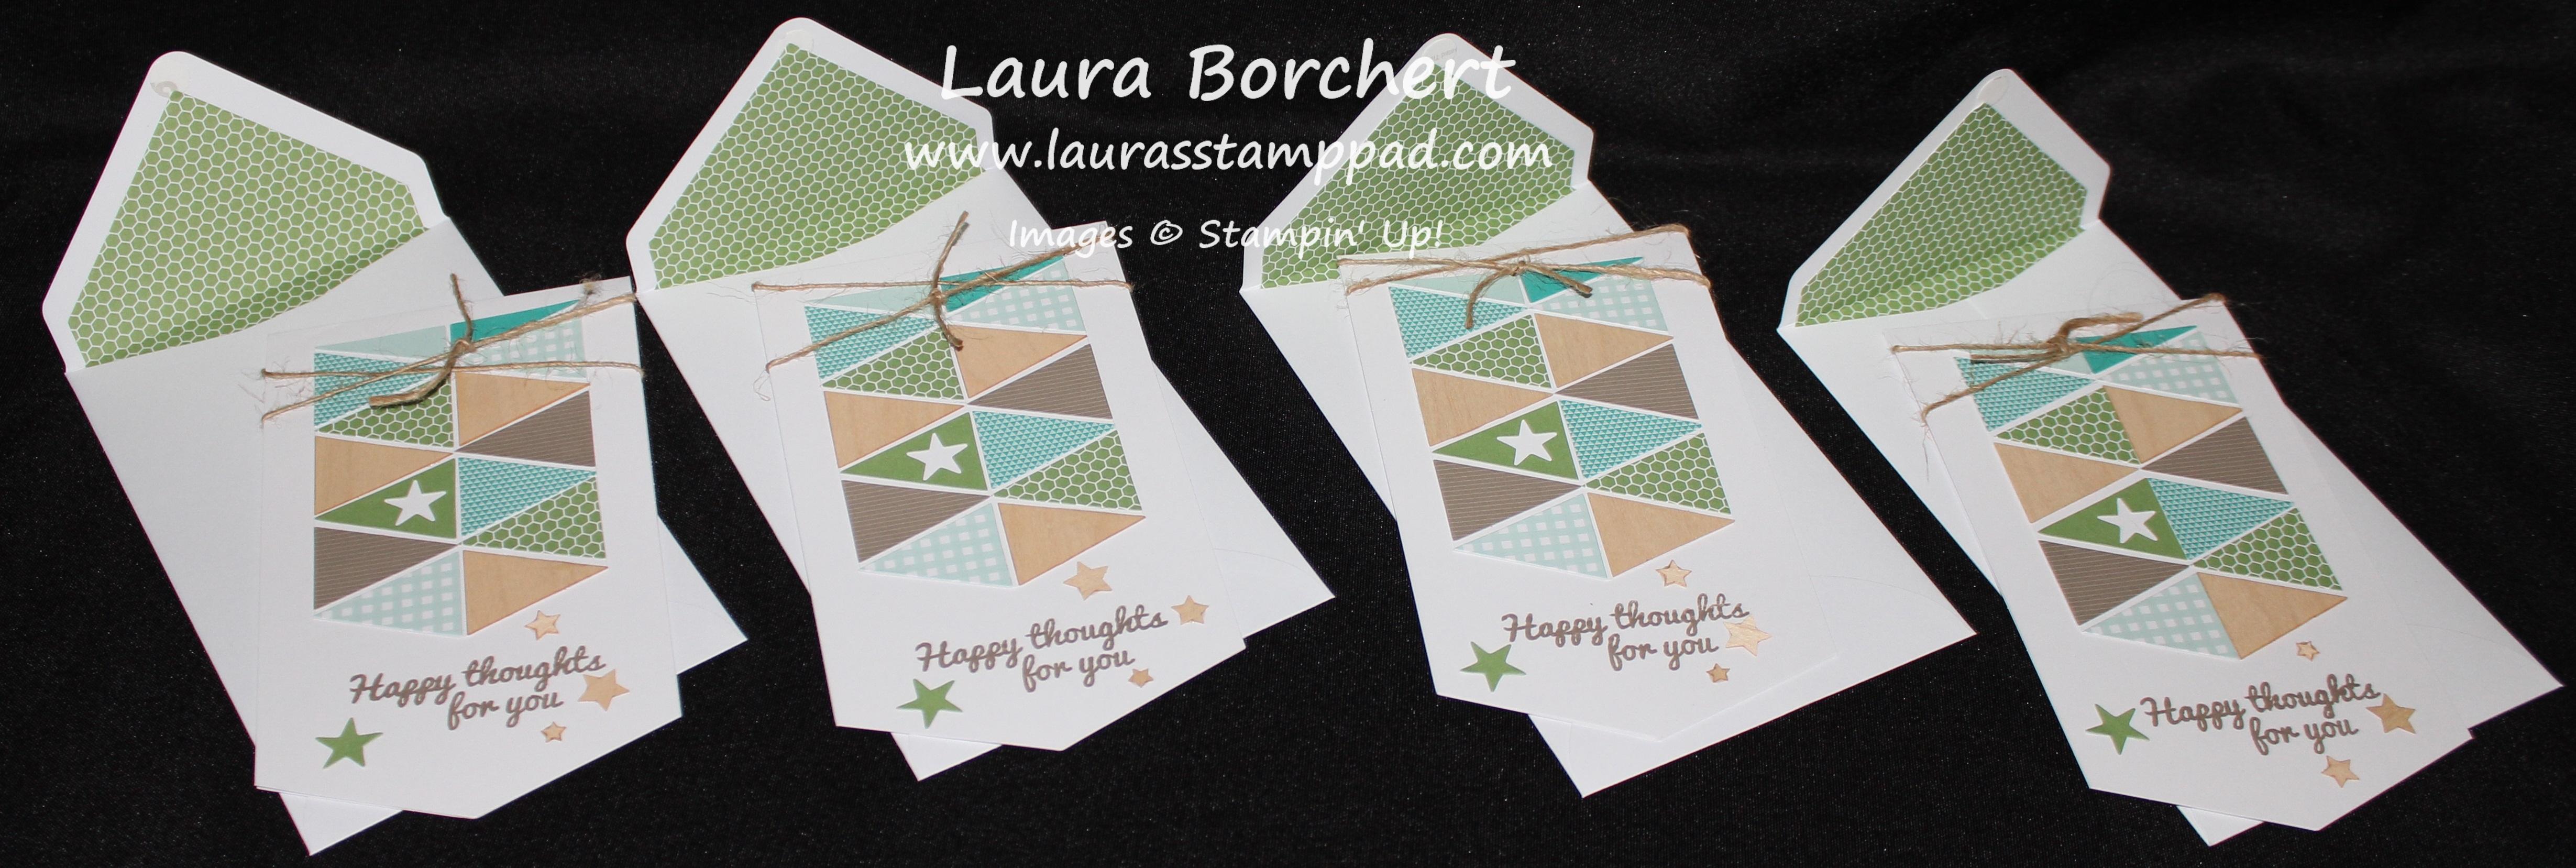 Green Cards, www.LaurasStampPad.com